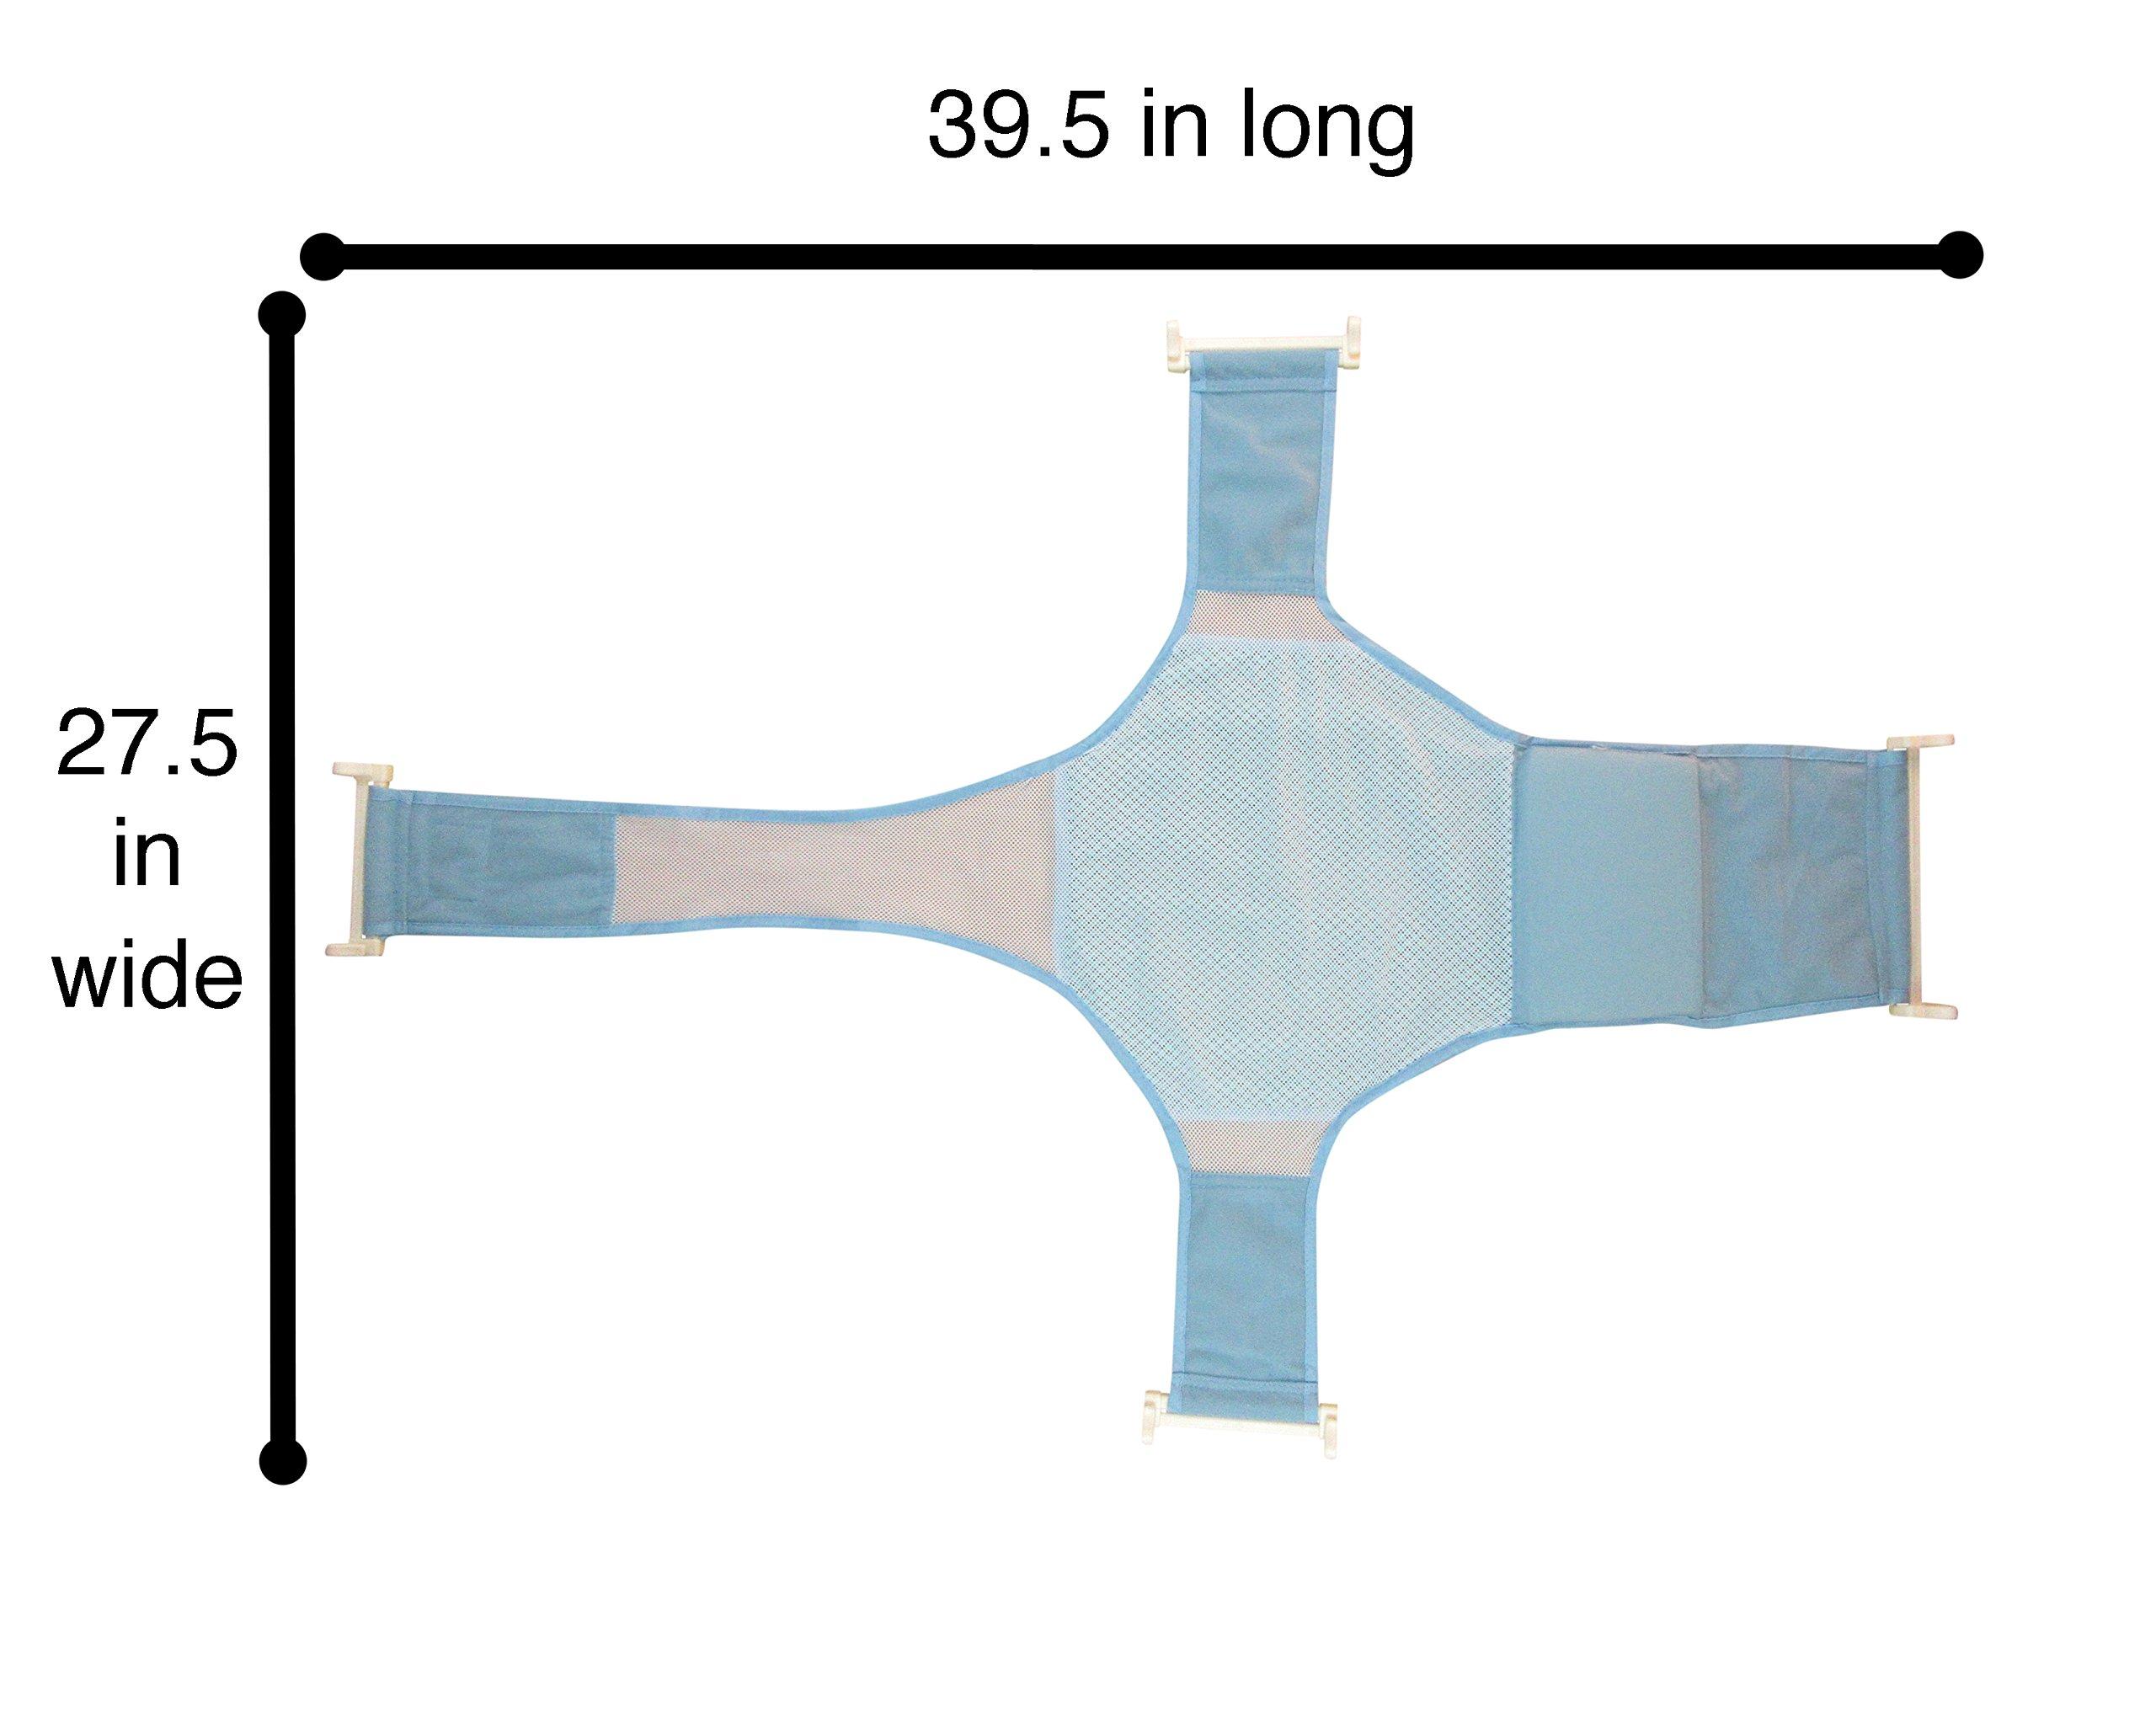 galleon baby bathtub seat support sling net karibu aojia infant bath tub hammock. Black Bedroom Furniture Sets. Home Design Ideas